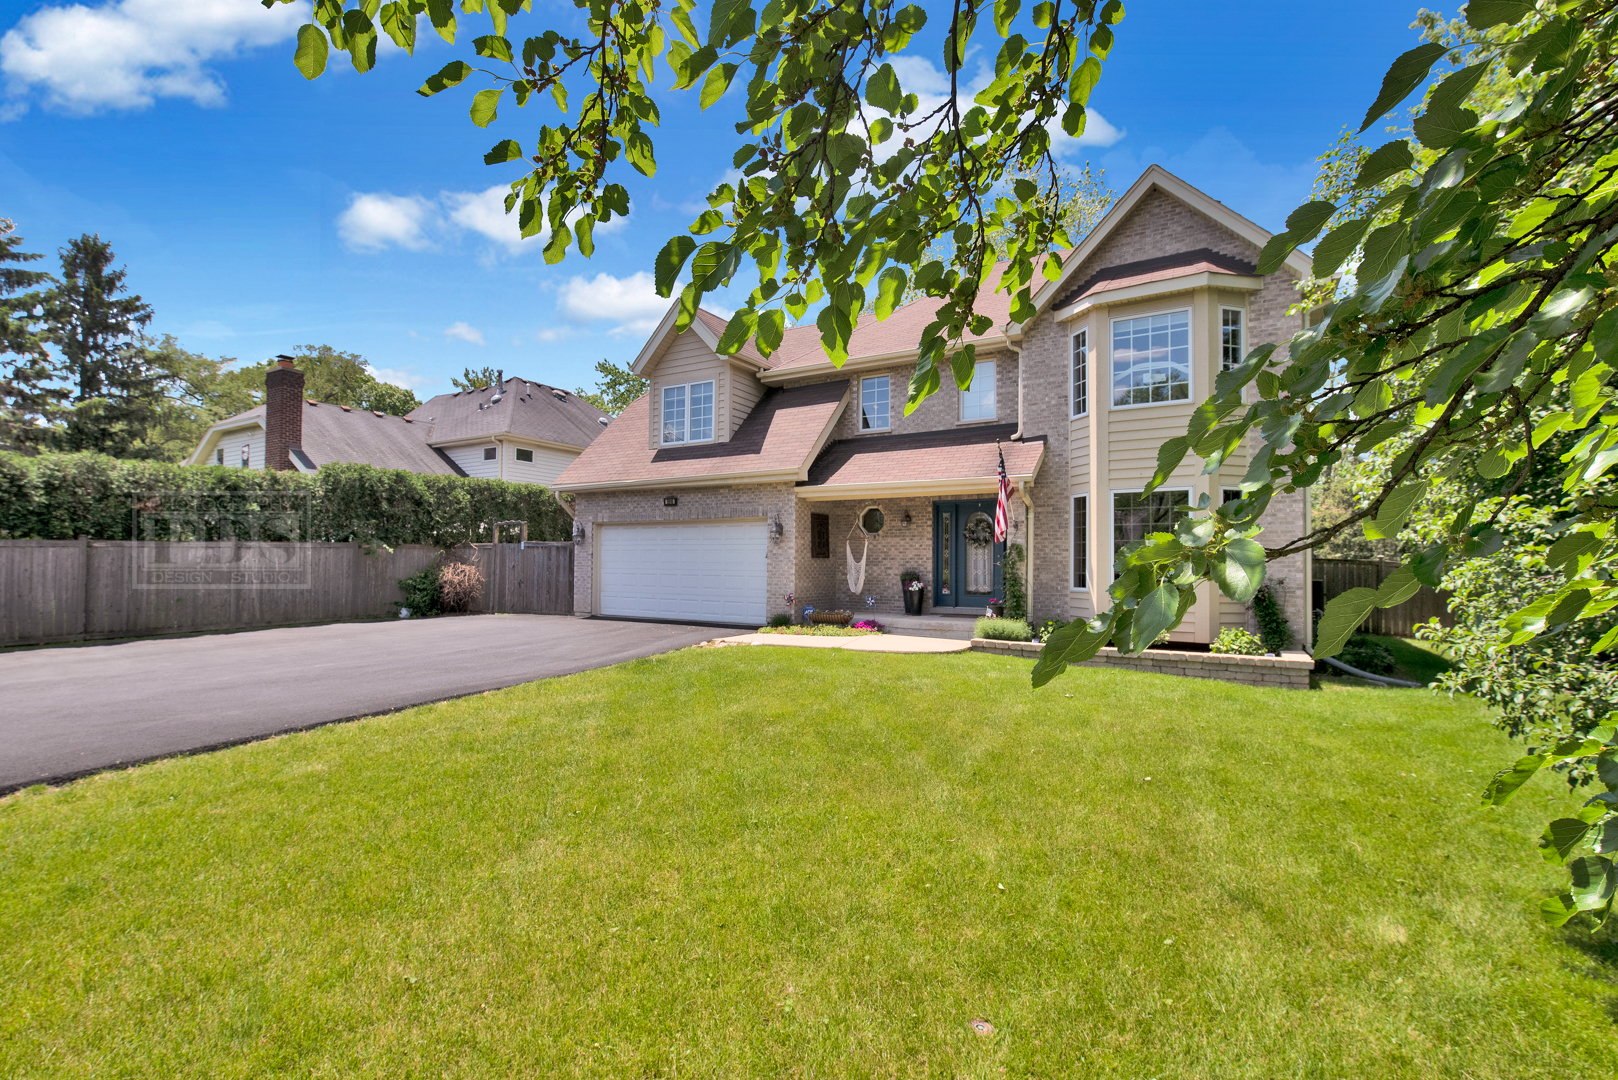 5910 South Brainard, LA GRANGE HIGHLANDS, Illinois, 60525